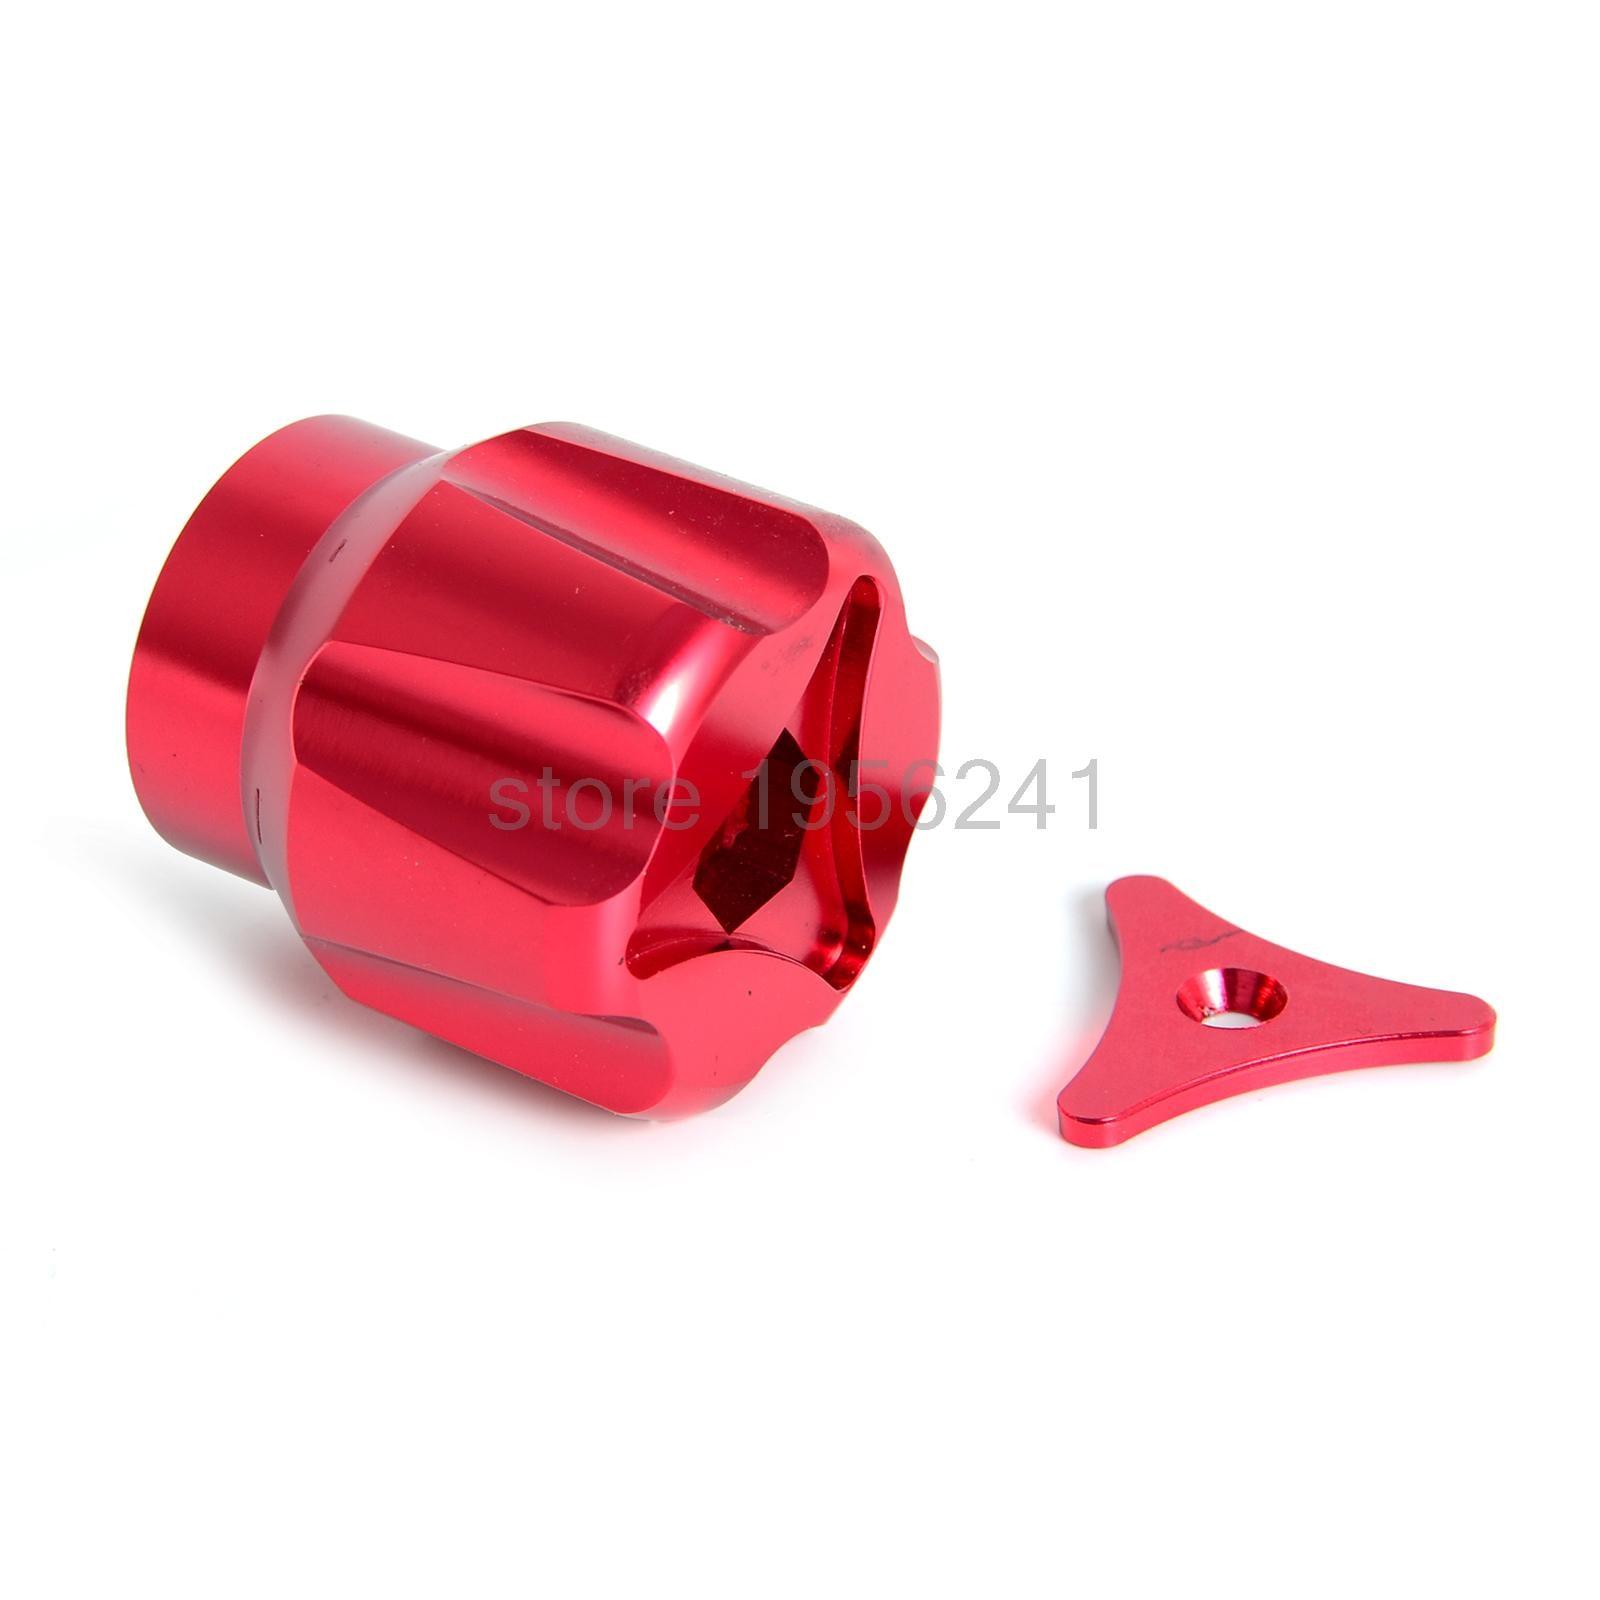 Задний Амортизатор пружина Поджатия Регулятор для Ducati diavel в 11-15 (Красный) Дукати сайту multistrada 1200 2010-2014 АБС